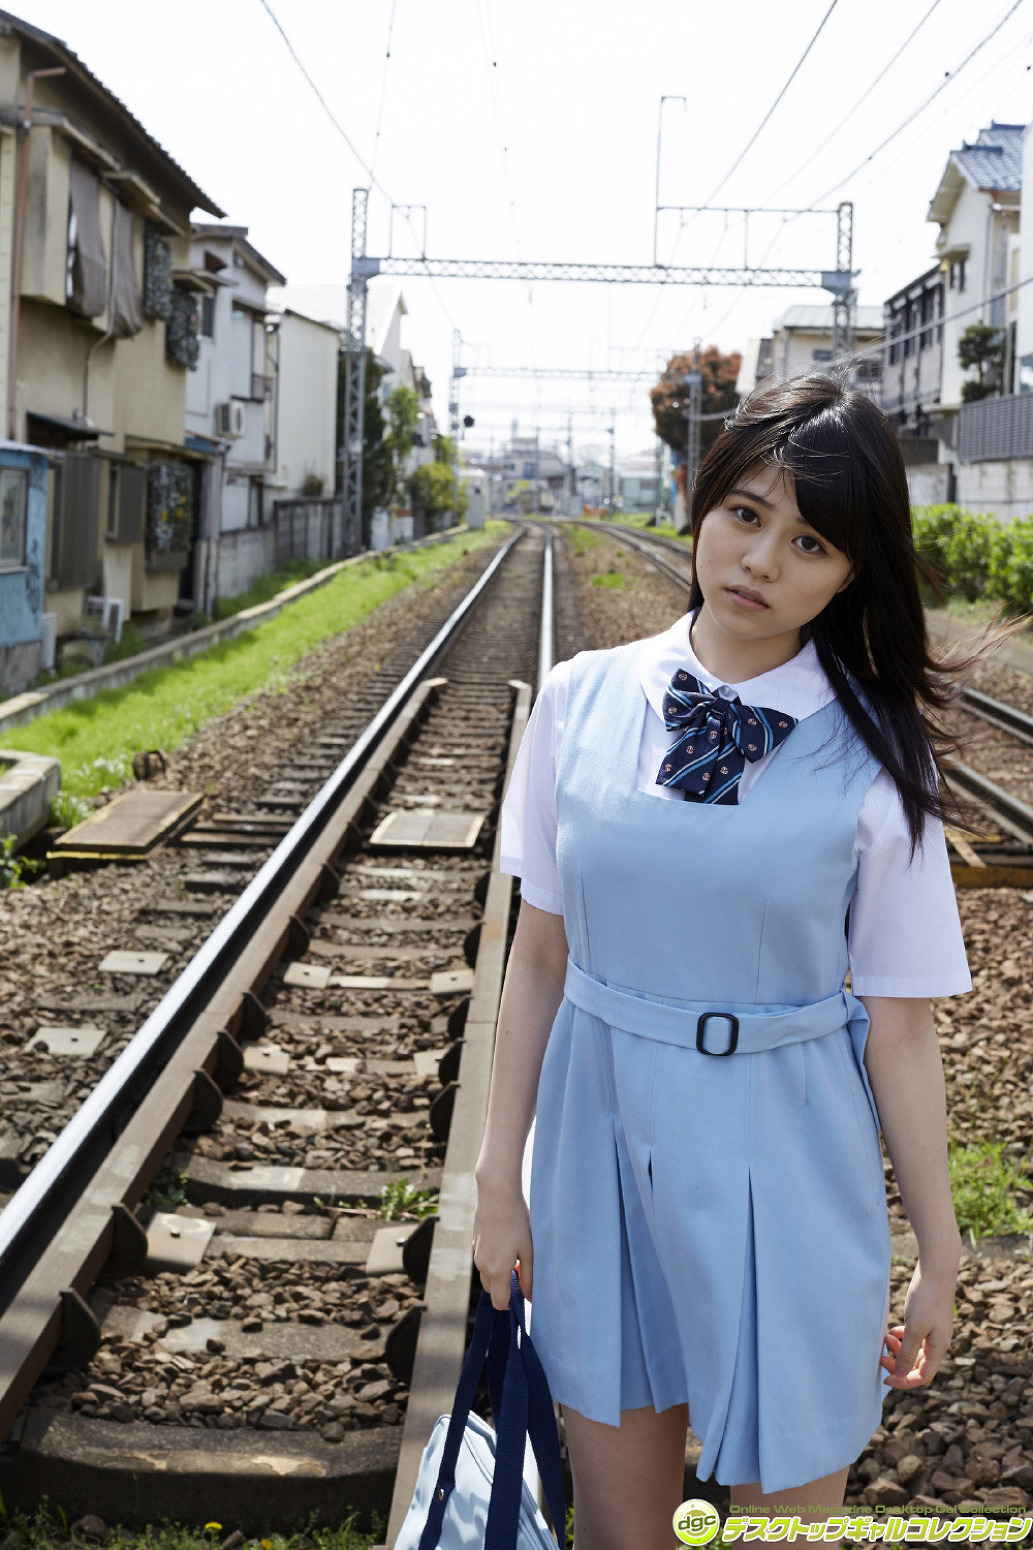 [DGC] 2015年09月号 No.1262 Hinata Shizaki 志崎ひなた [100p]